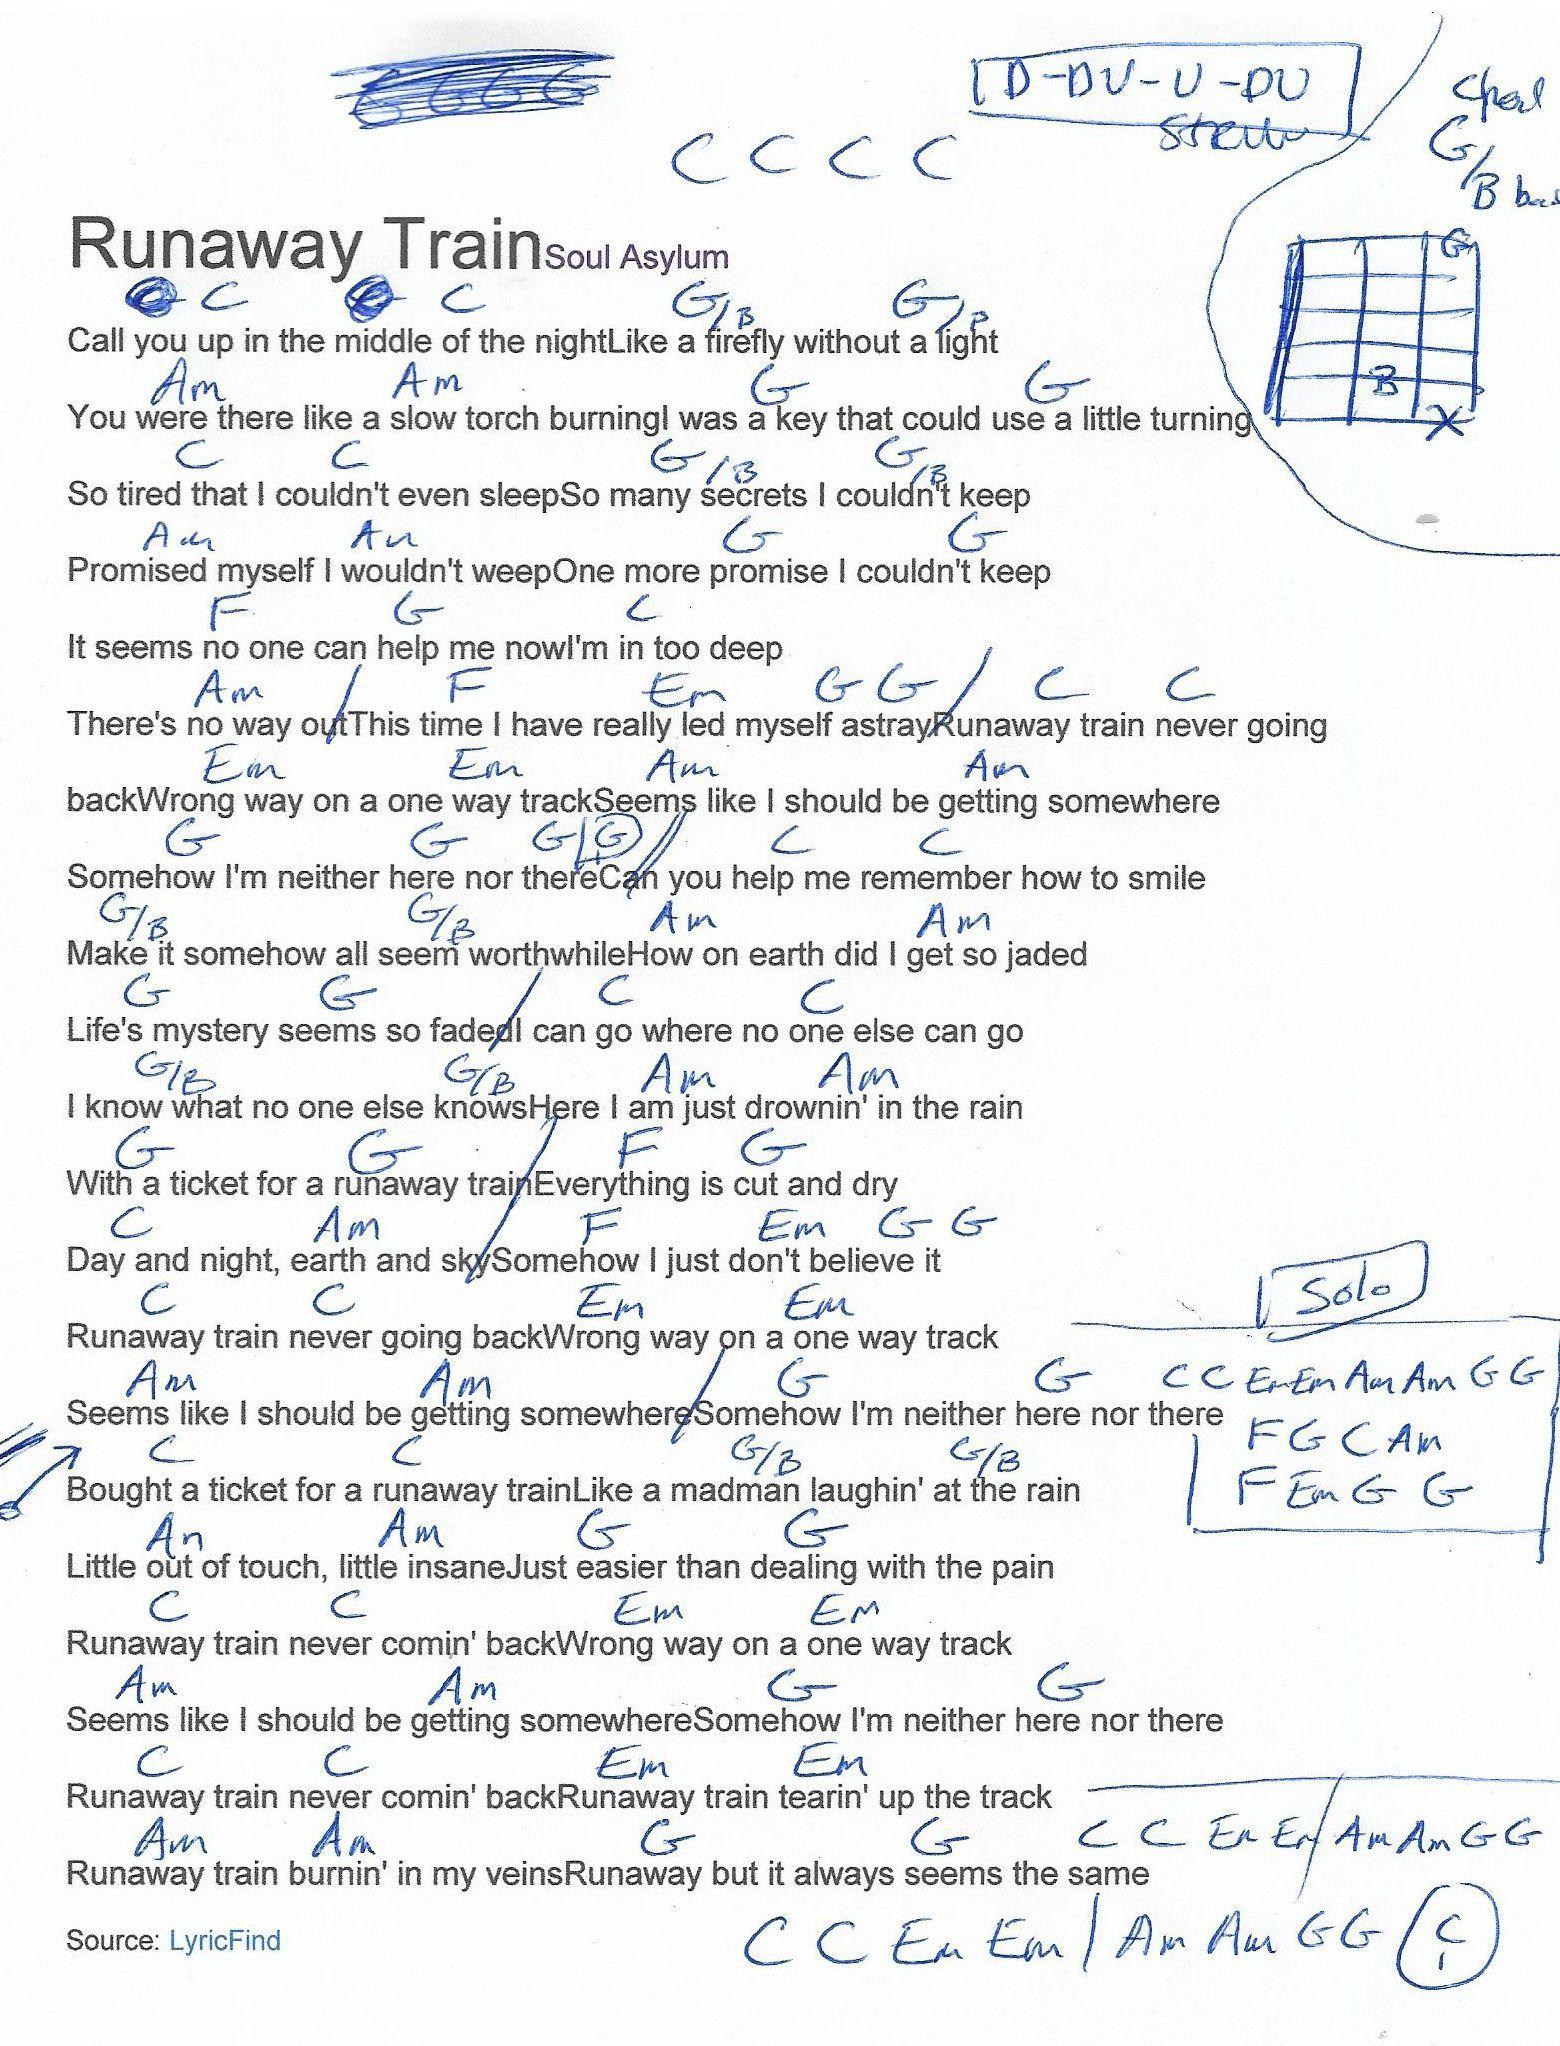 Runaway Train Soul Asylum Guitar Chord Chart   Lyrics and chords ...